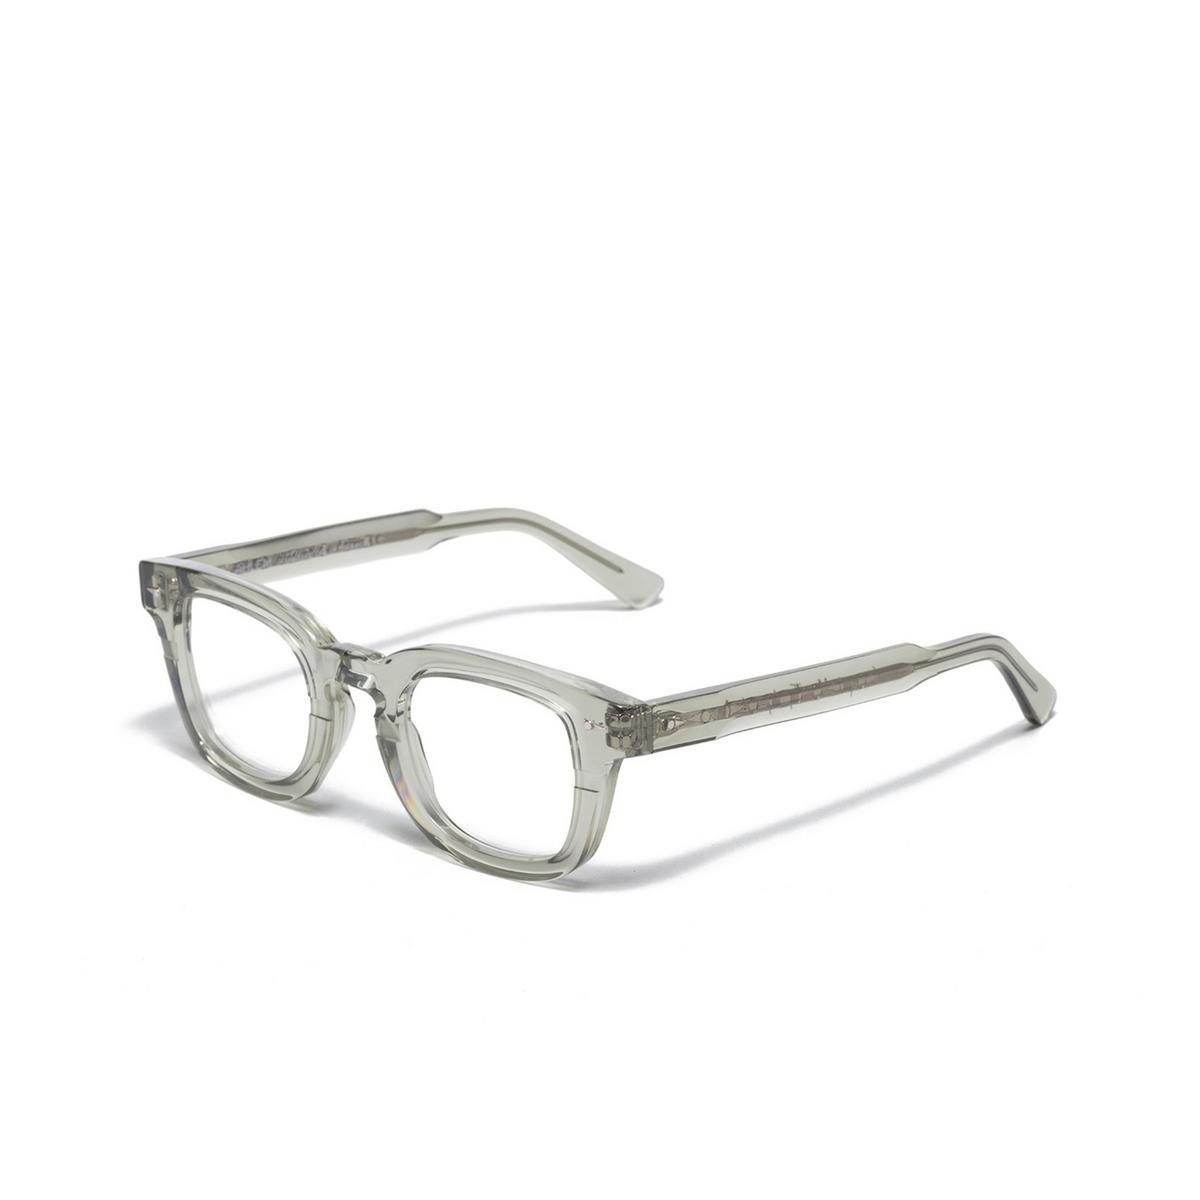 Ahlem® Square Eyeglasses: Champ De Mars Optic color Thymelight.